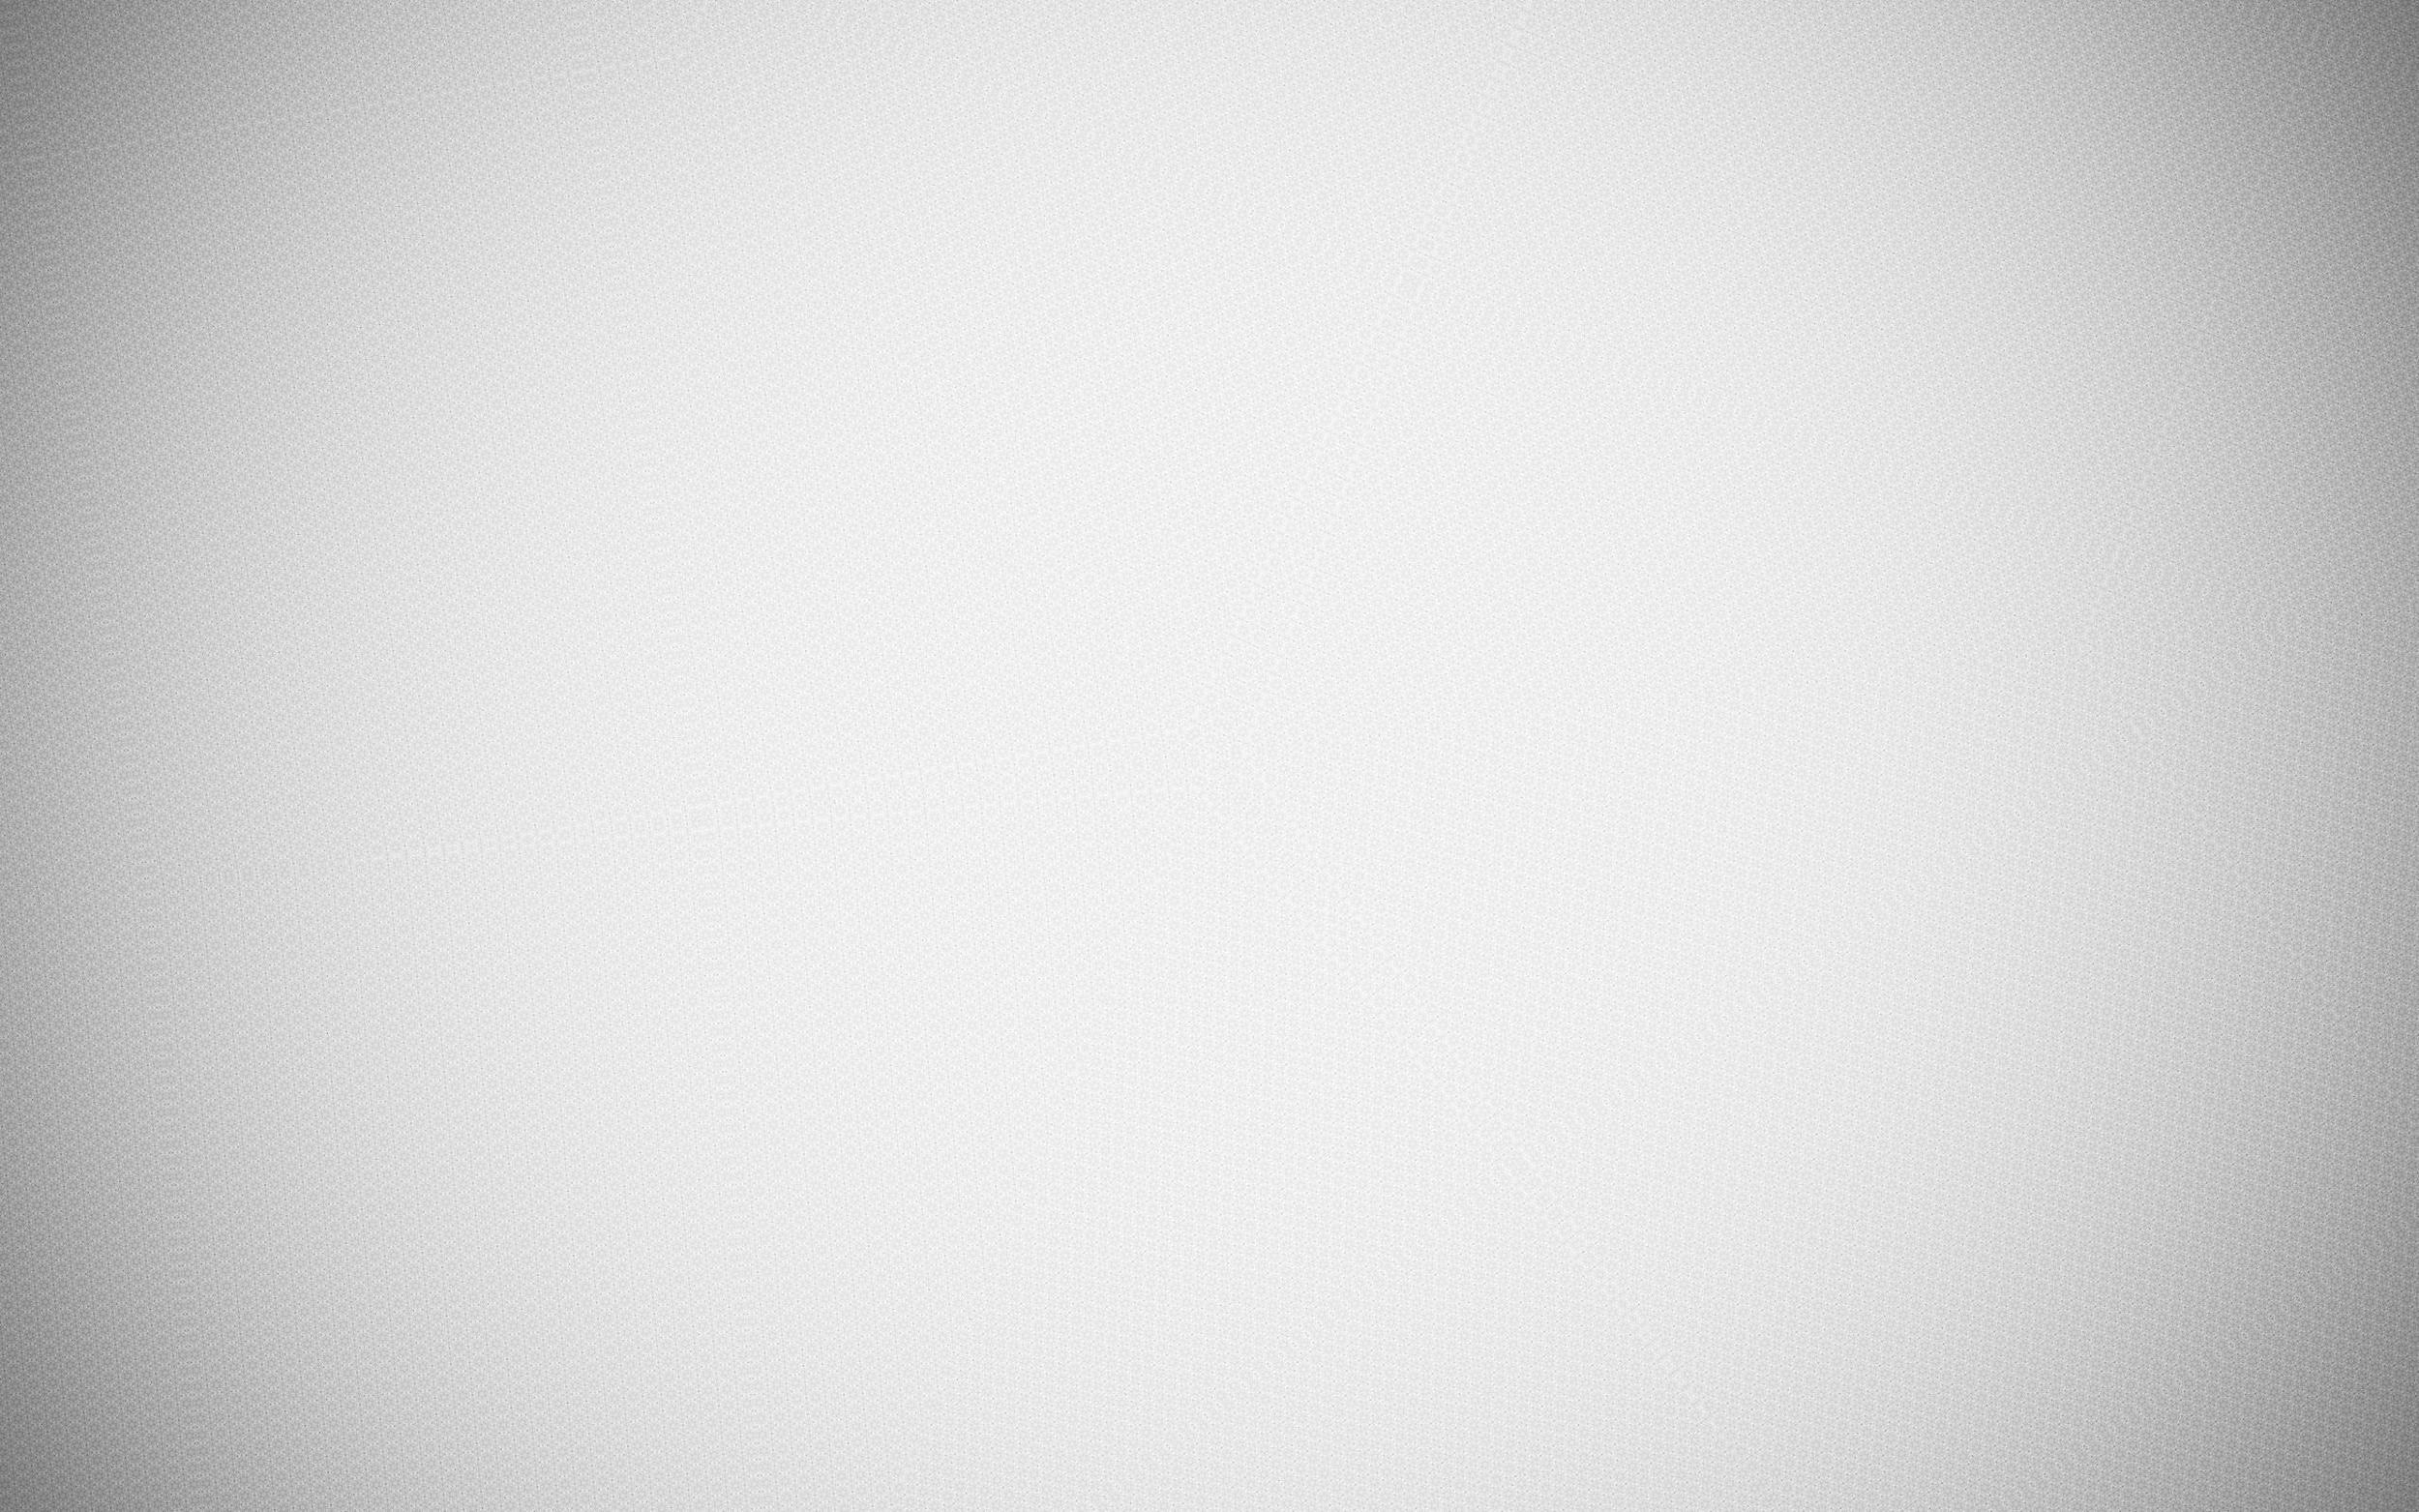 Light Grey Wallpapers - Wallpaper Cave |Light Grey Wallpaper Hd